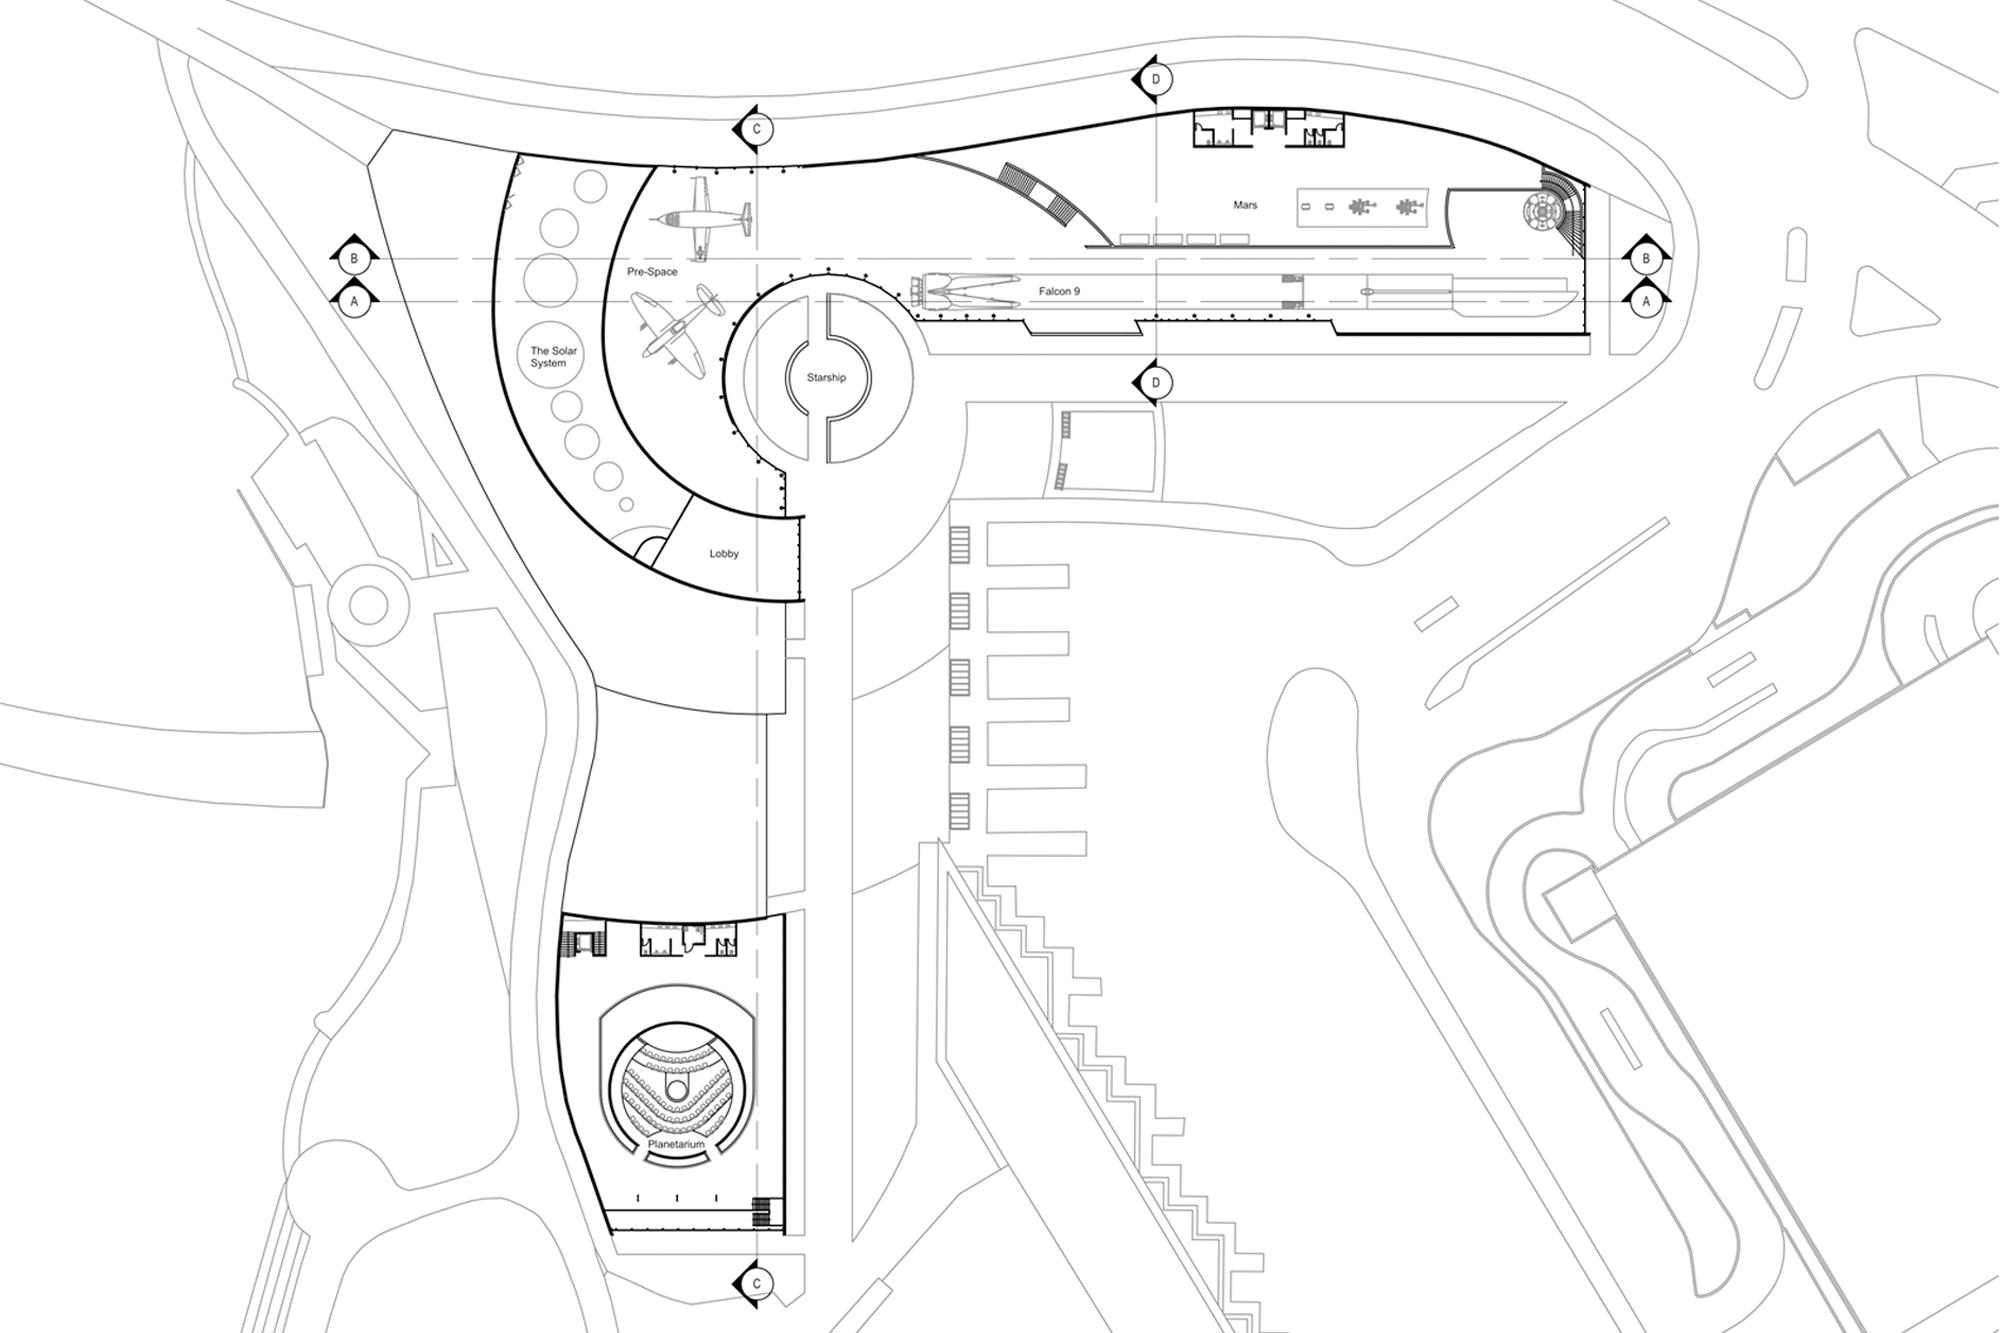 James Boxell Starbase Derby plan 2